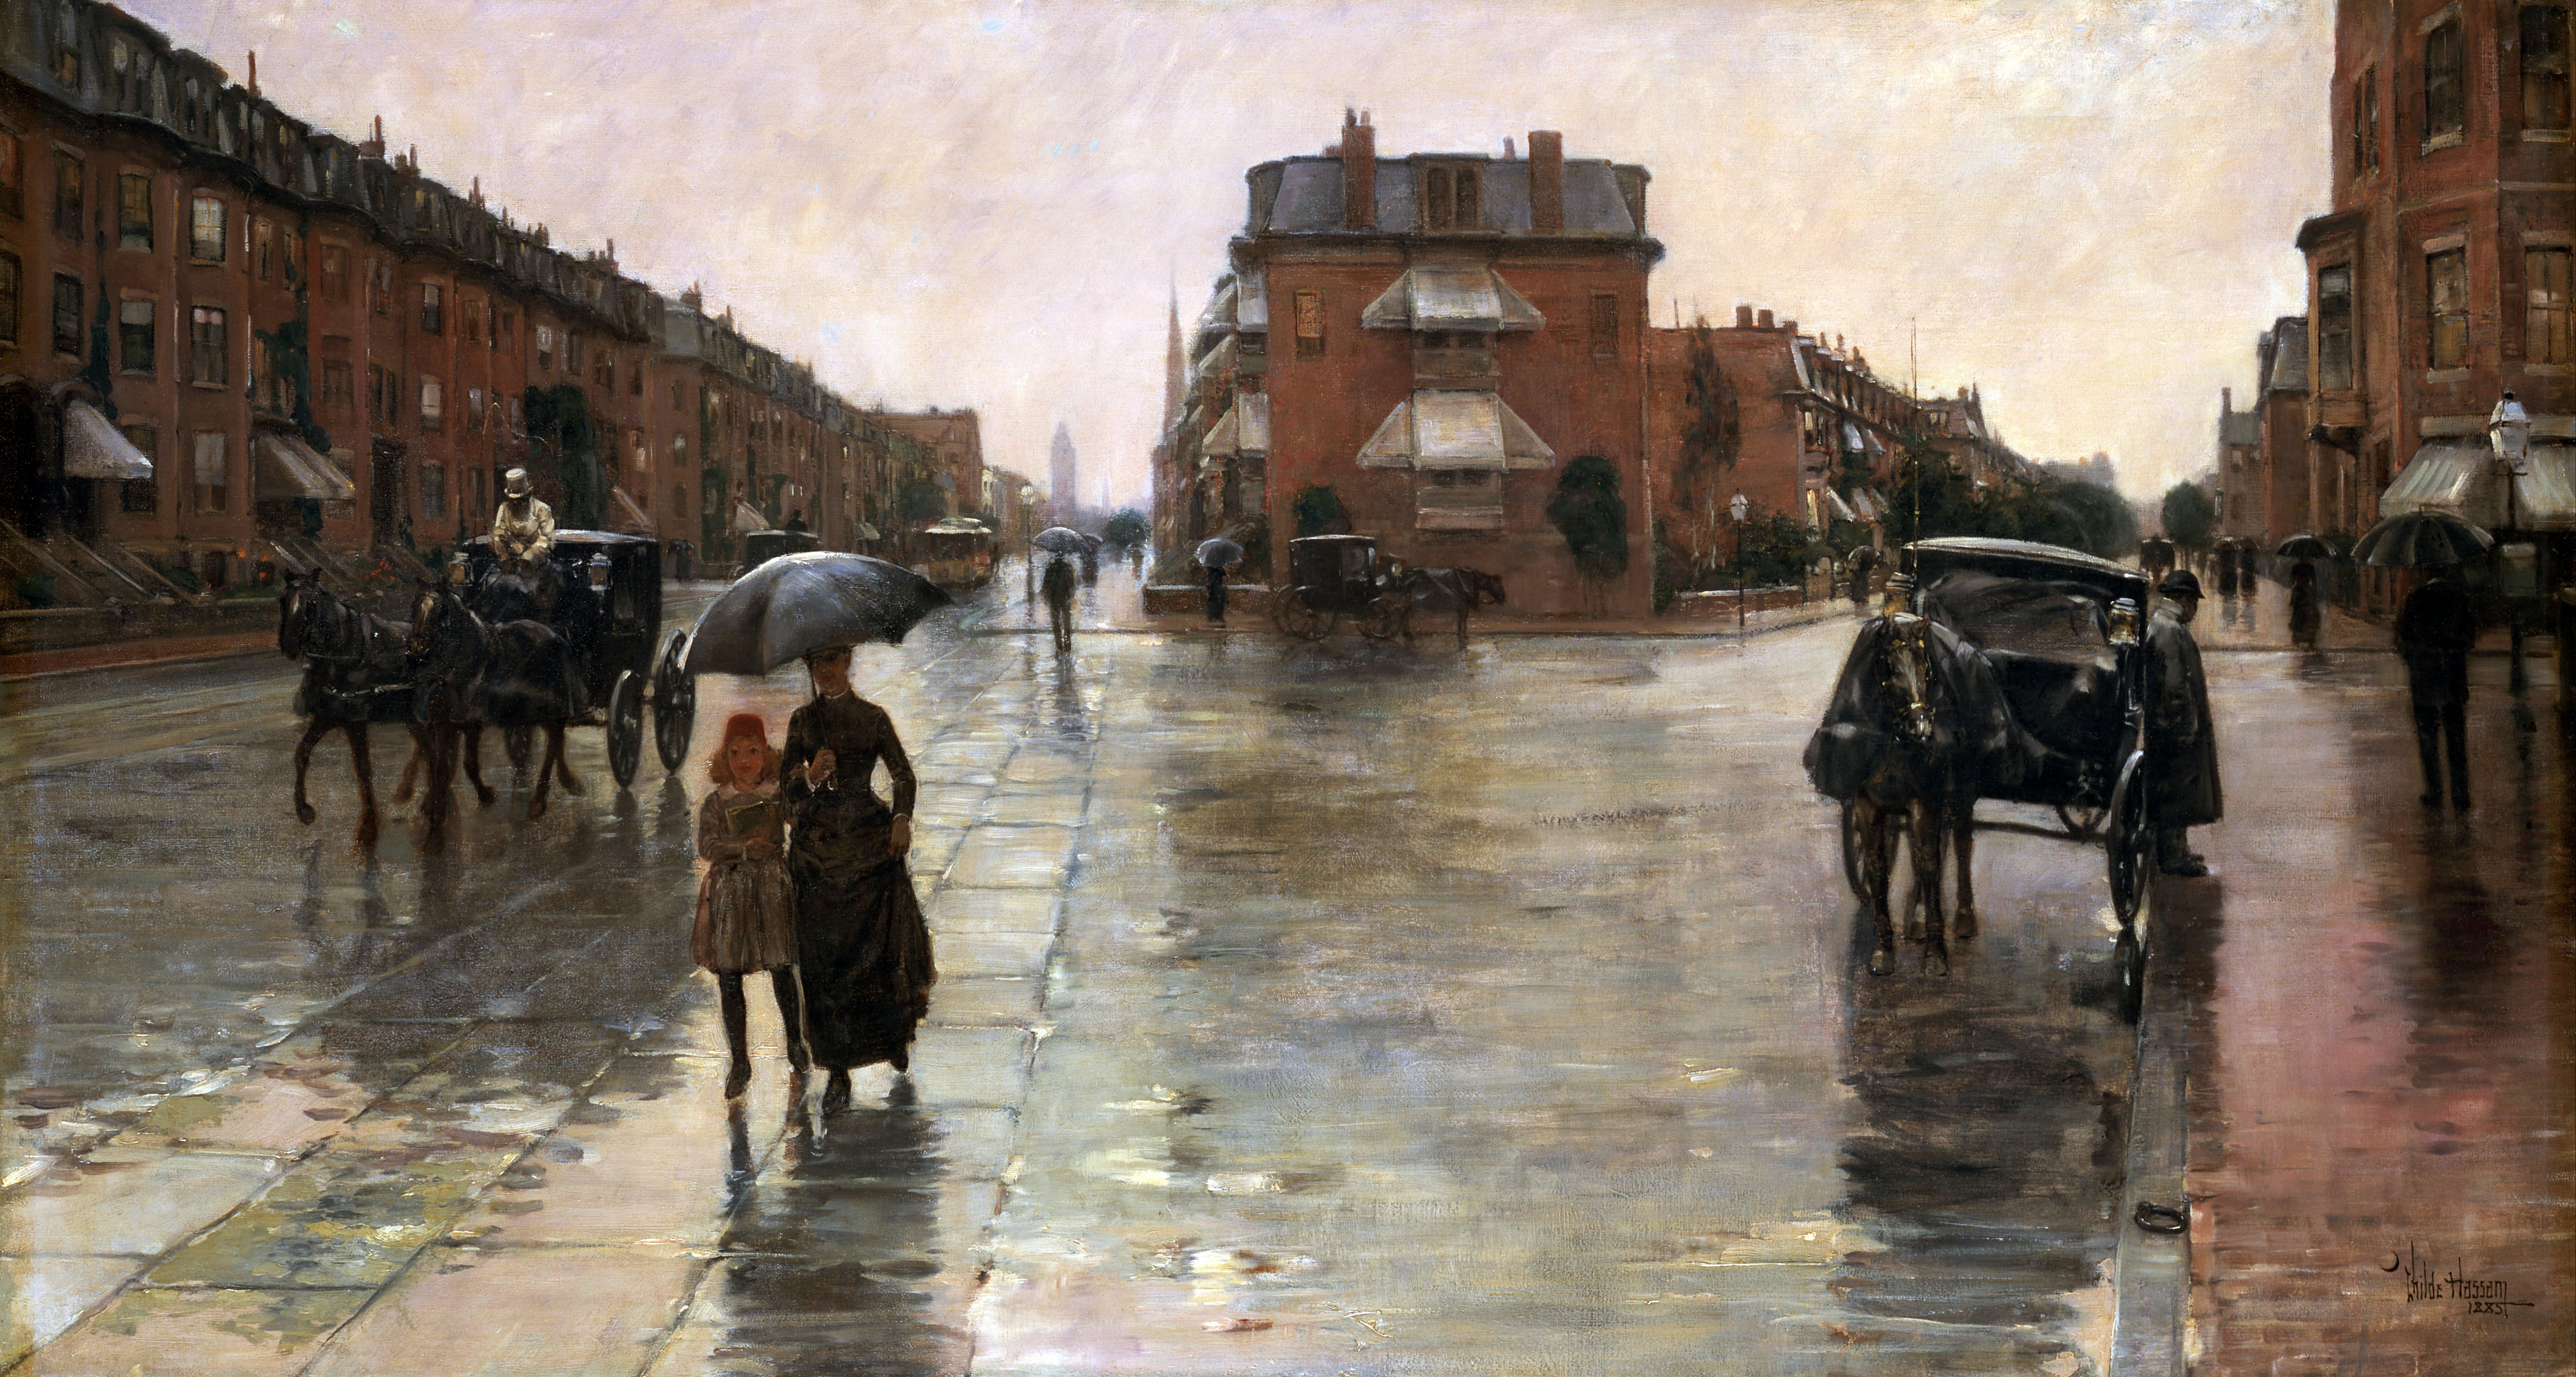 File:Childe Hassam - Rainy Day, Boston - Google Art ...